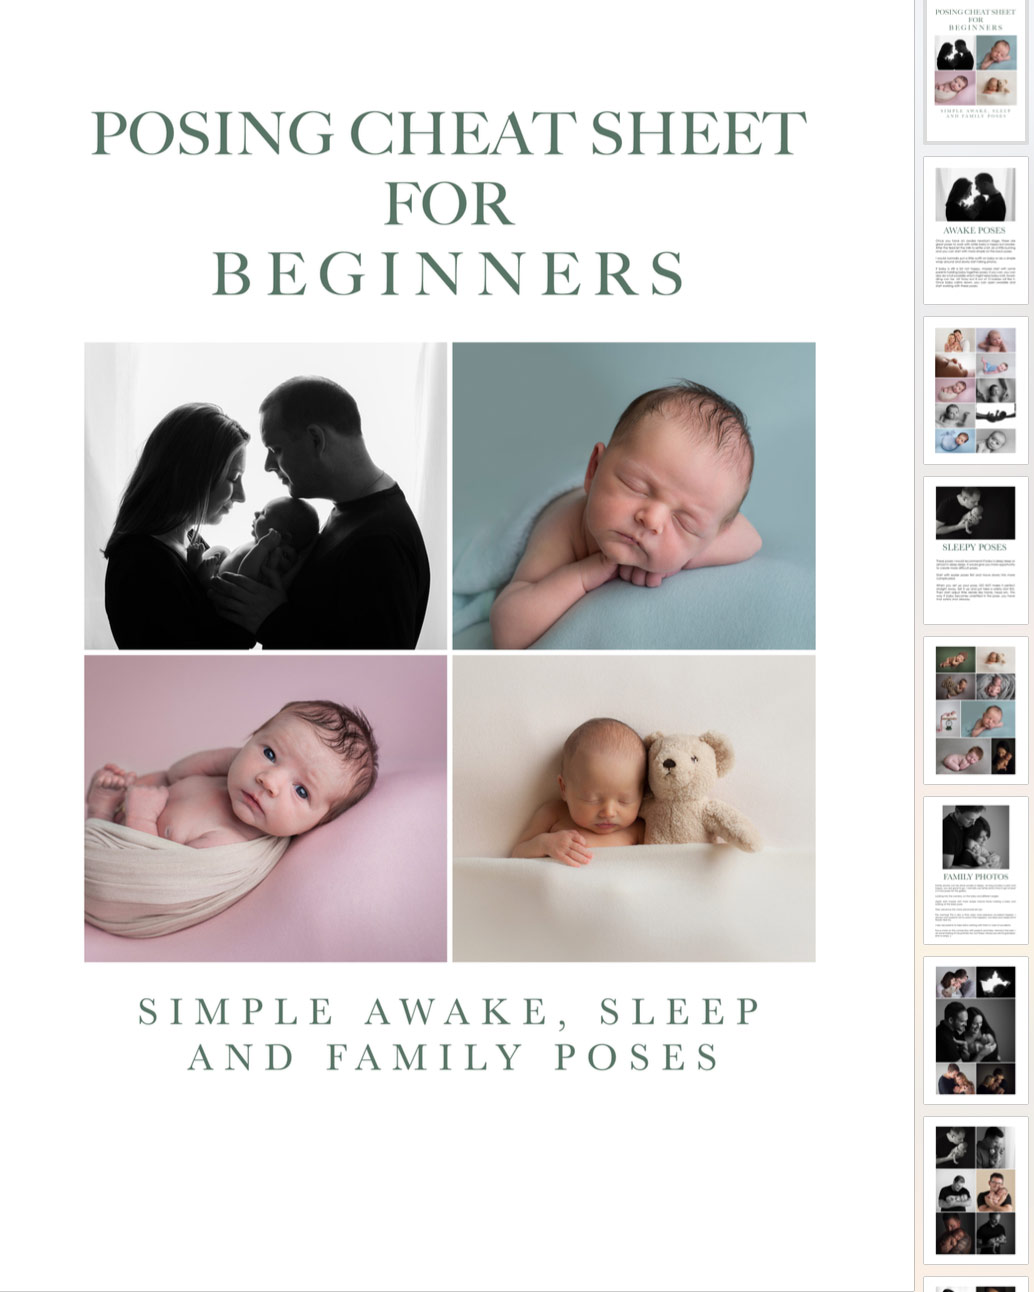 newborn poses cheat sheet for beginners